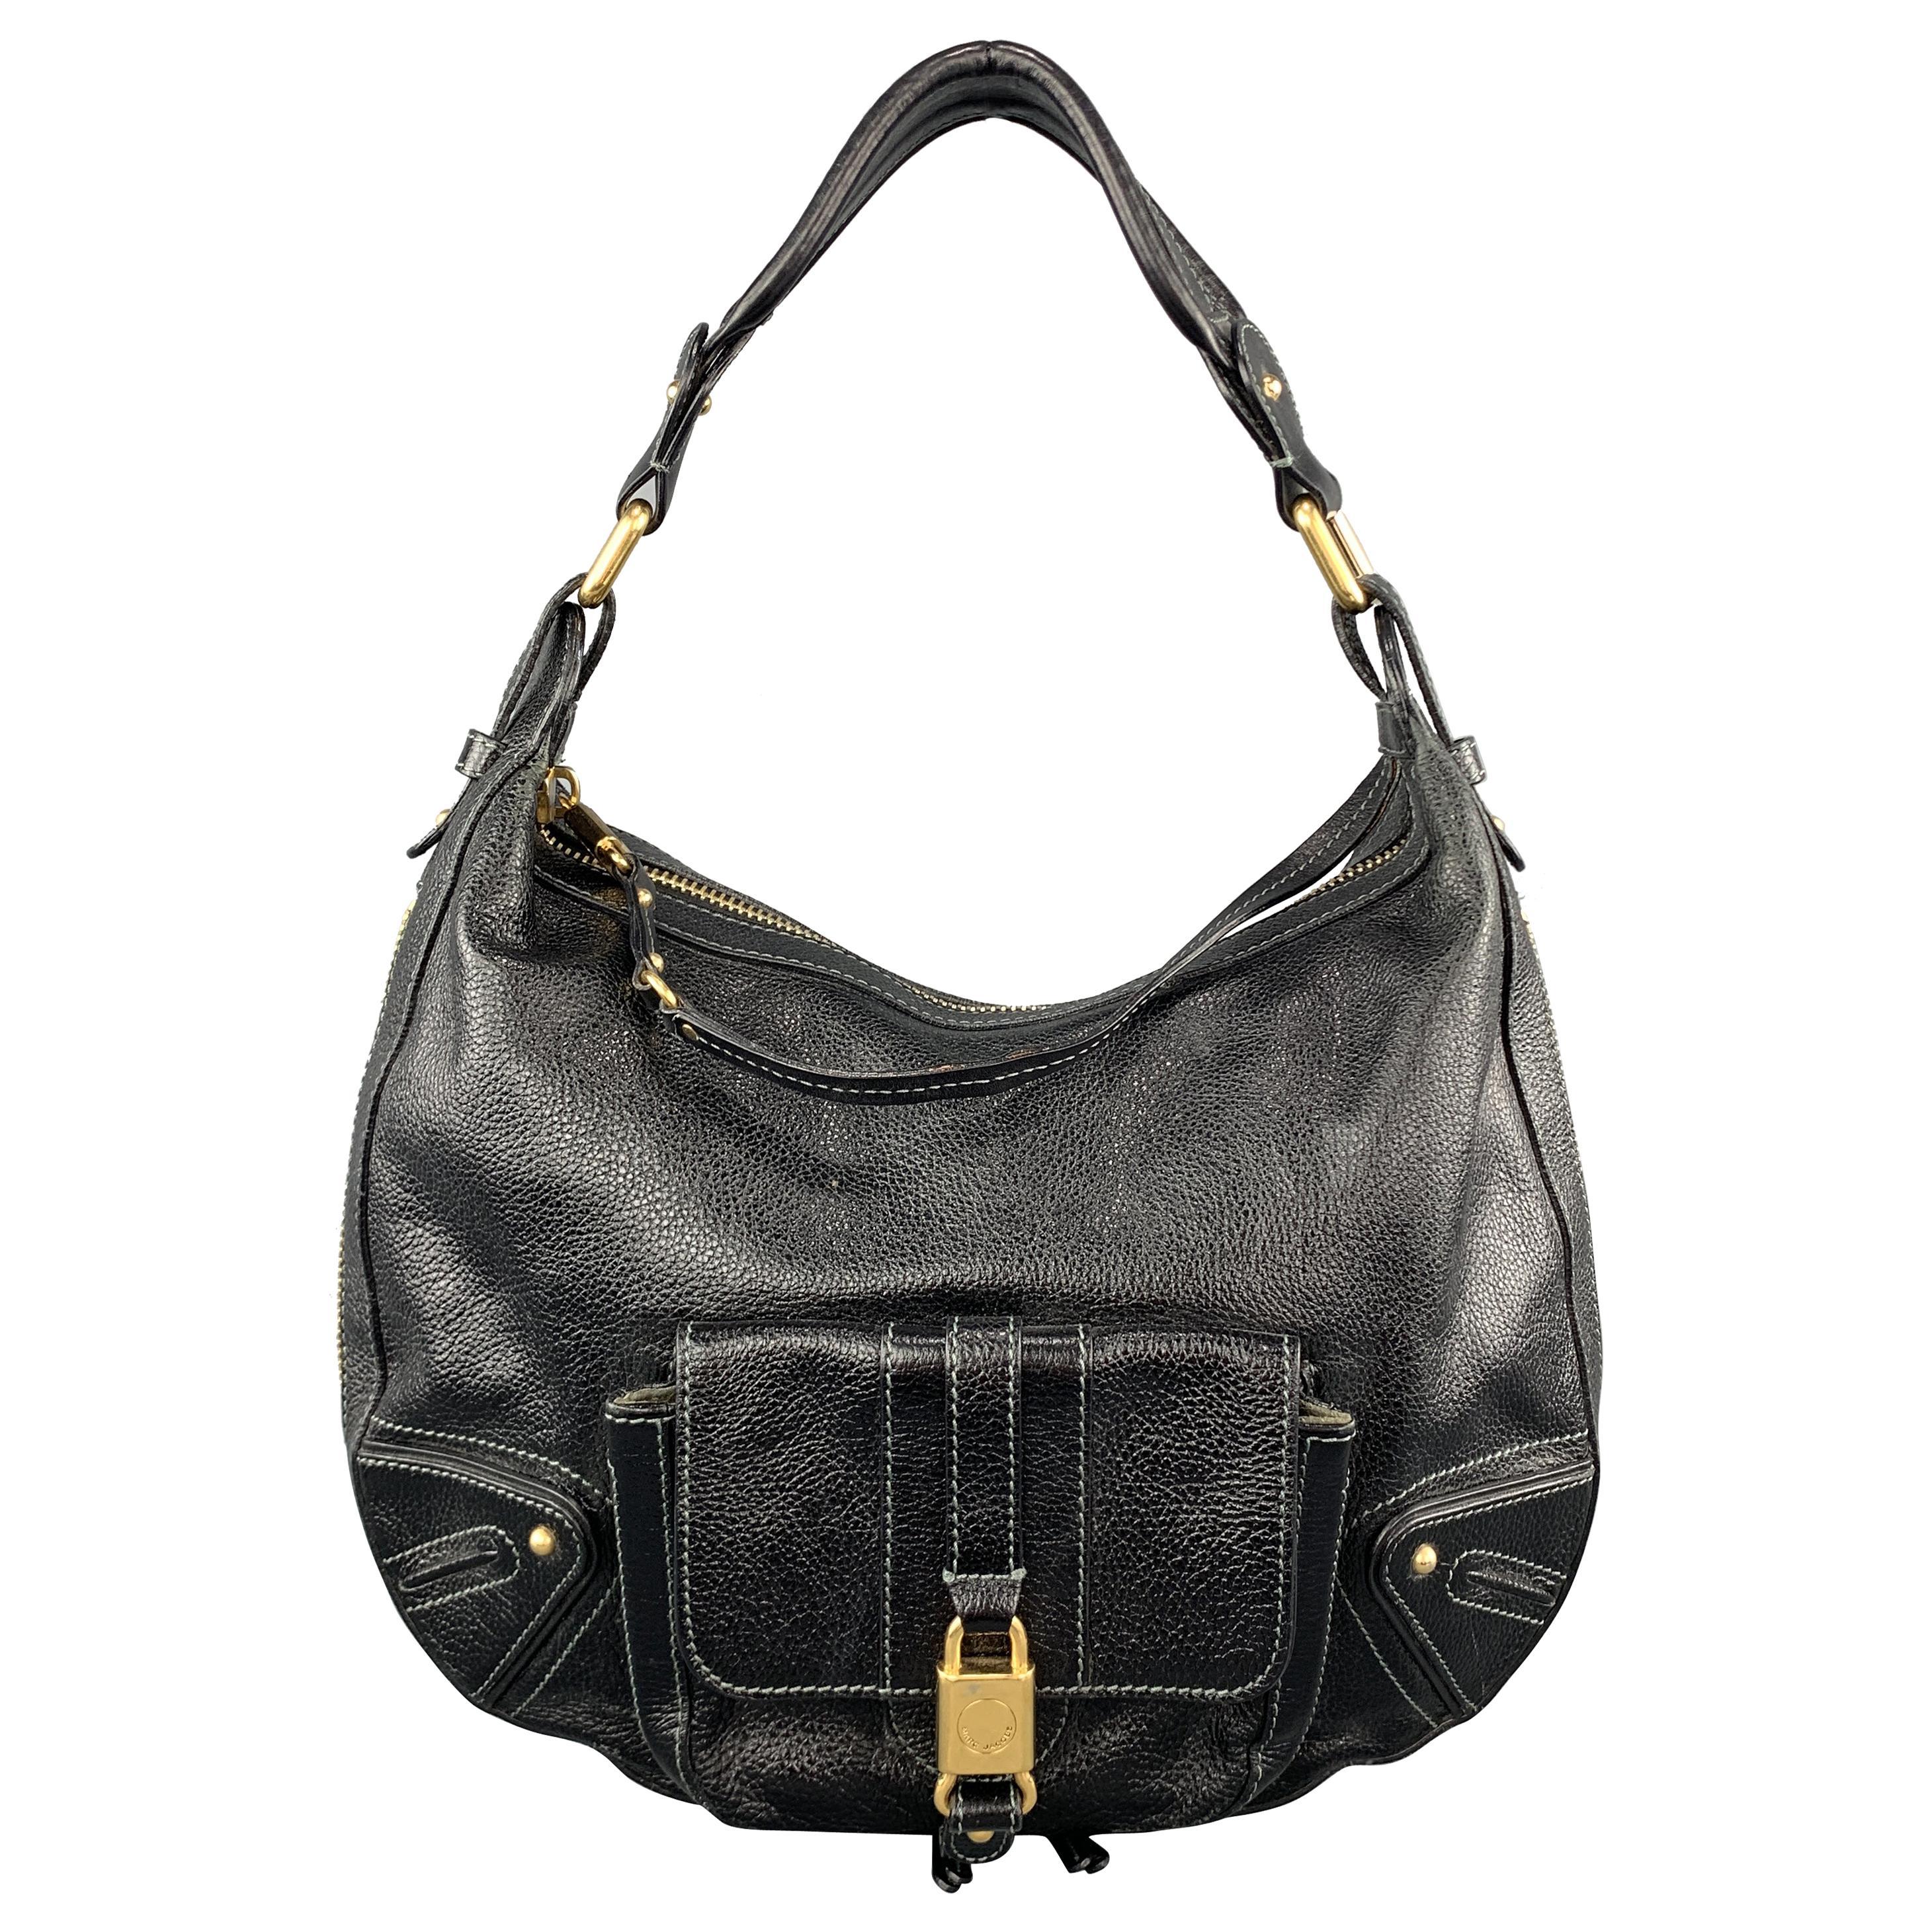 MARC JACOBS Black Leather Gold Tone Lock Zip Hobo Handbag